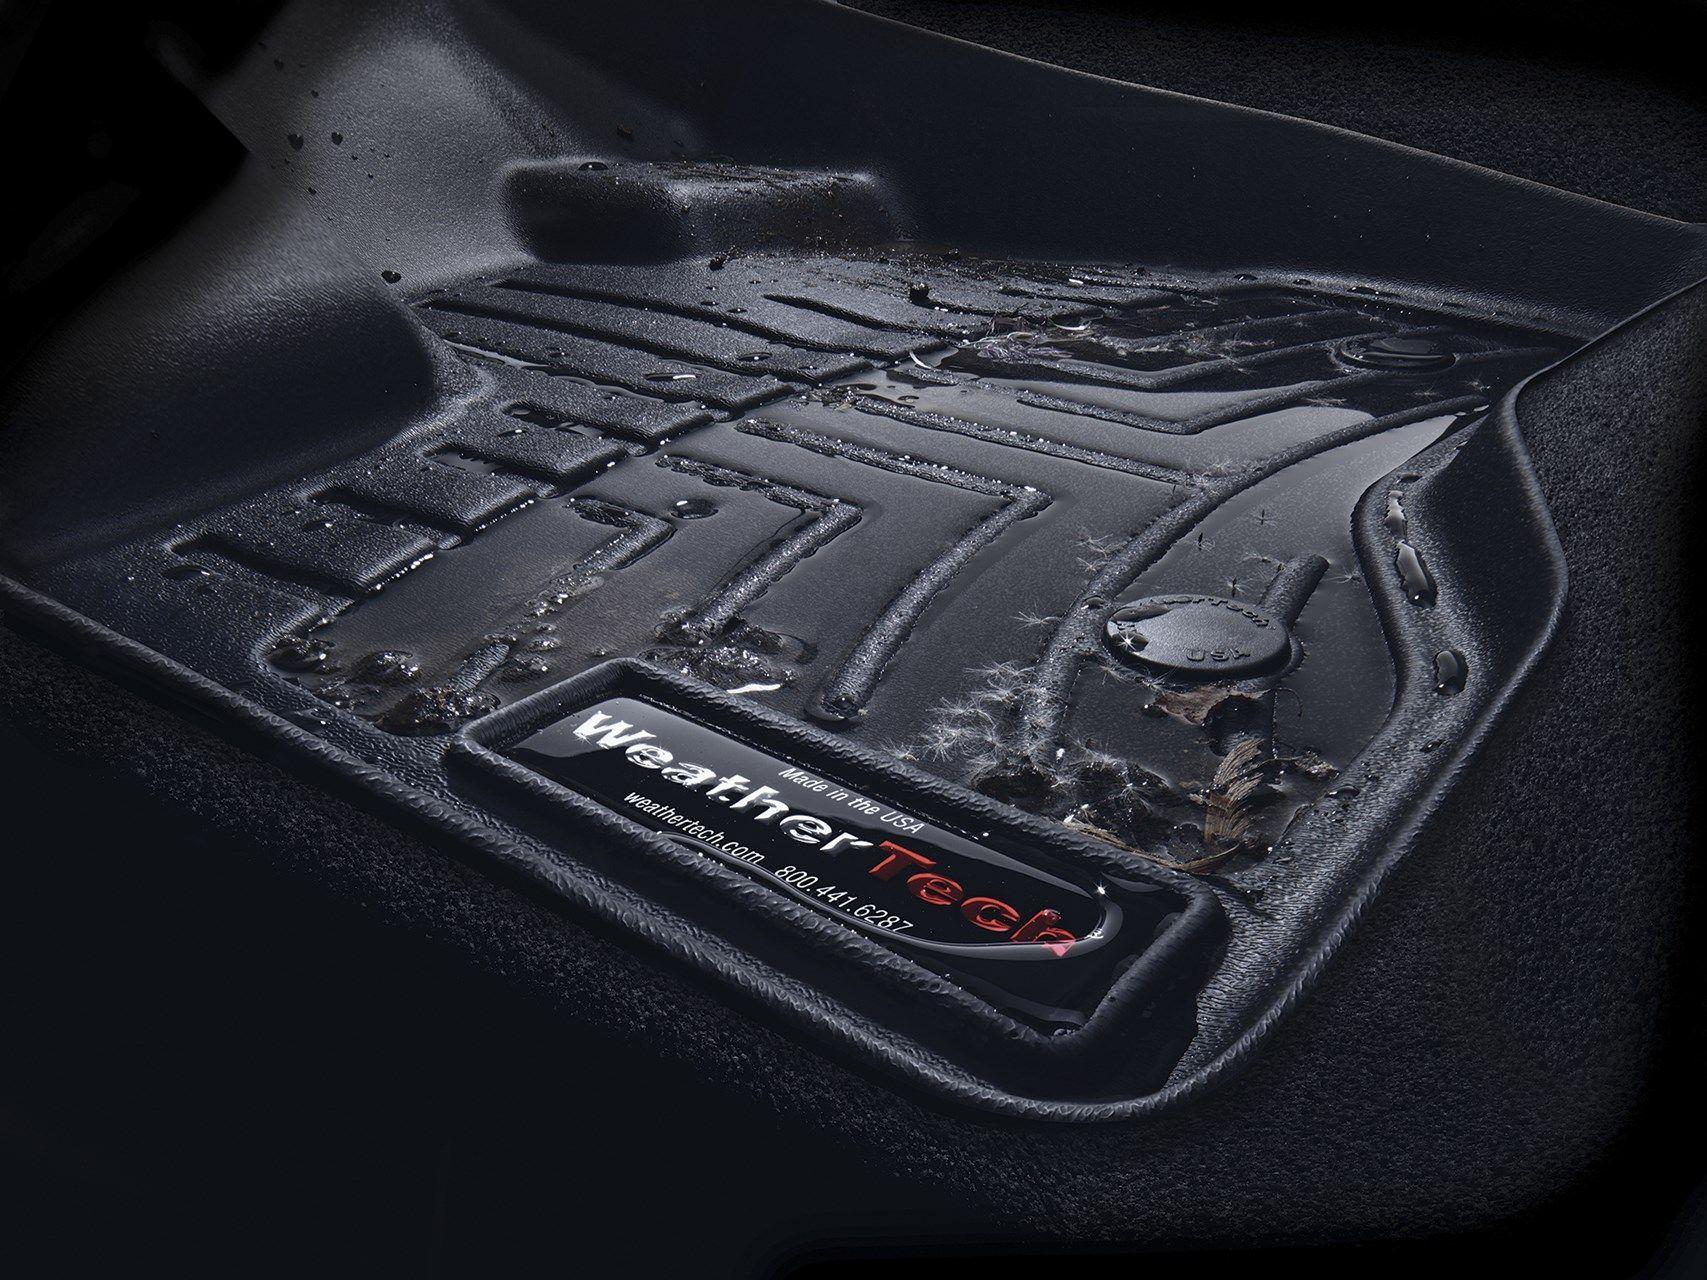 xterra sentra elegant weathertech nissan of crv excellent honda floor mats